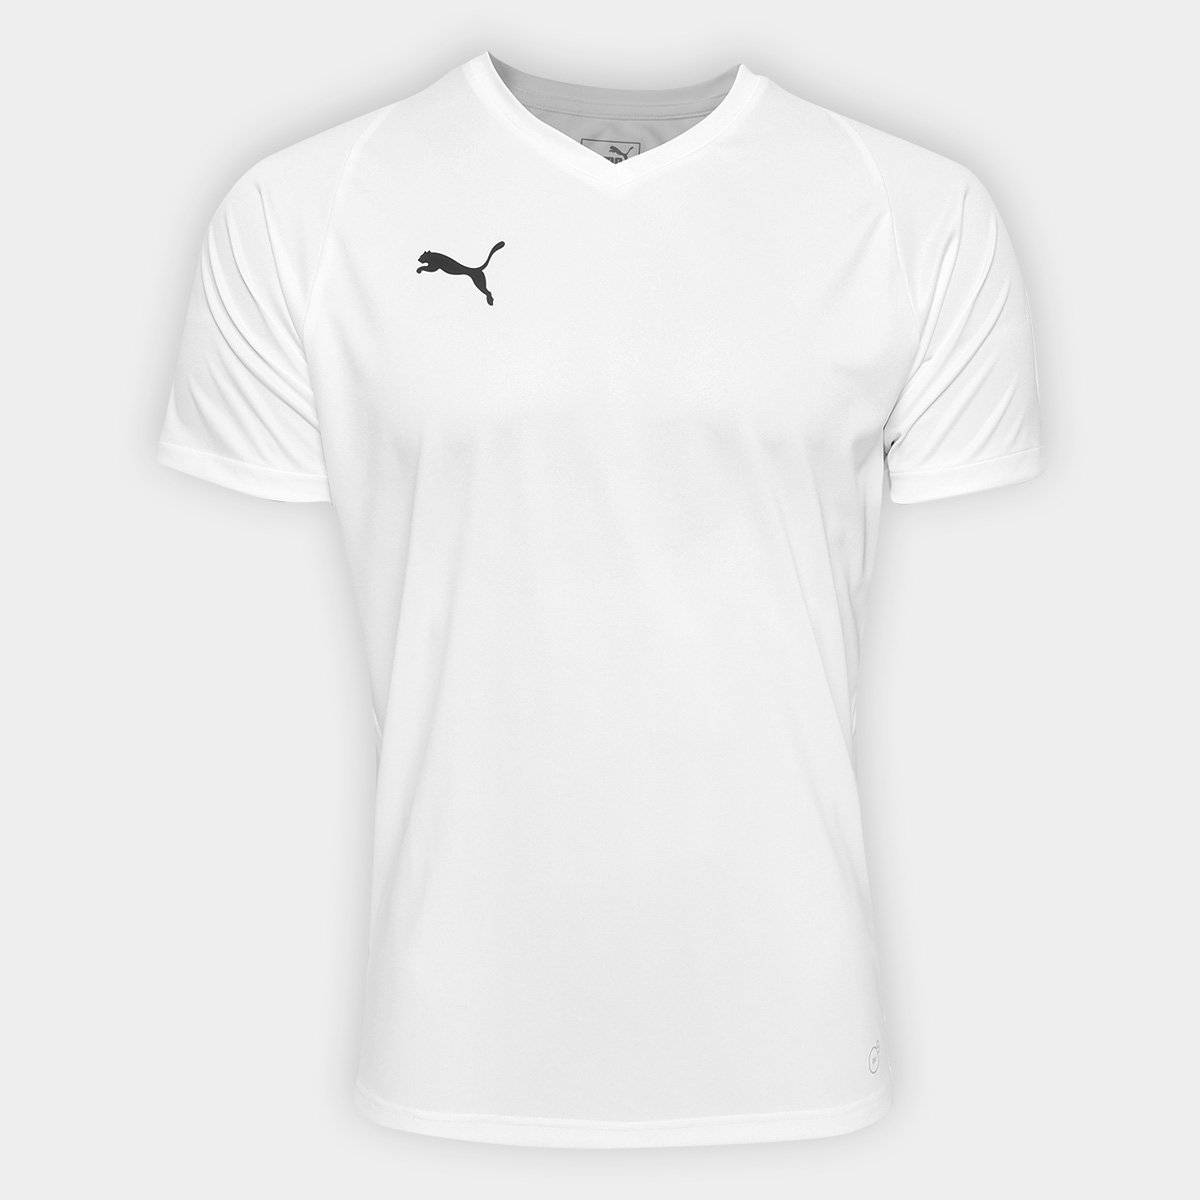 db531089af Camisa Puma Liga Jersey Core Masculina - Branco e Preto - Compre ...